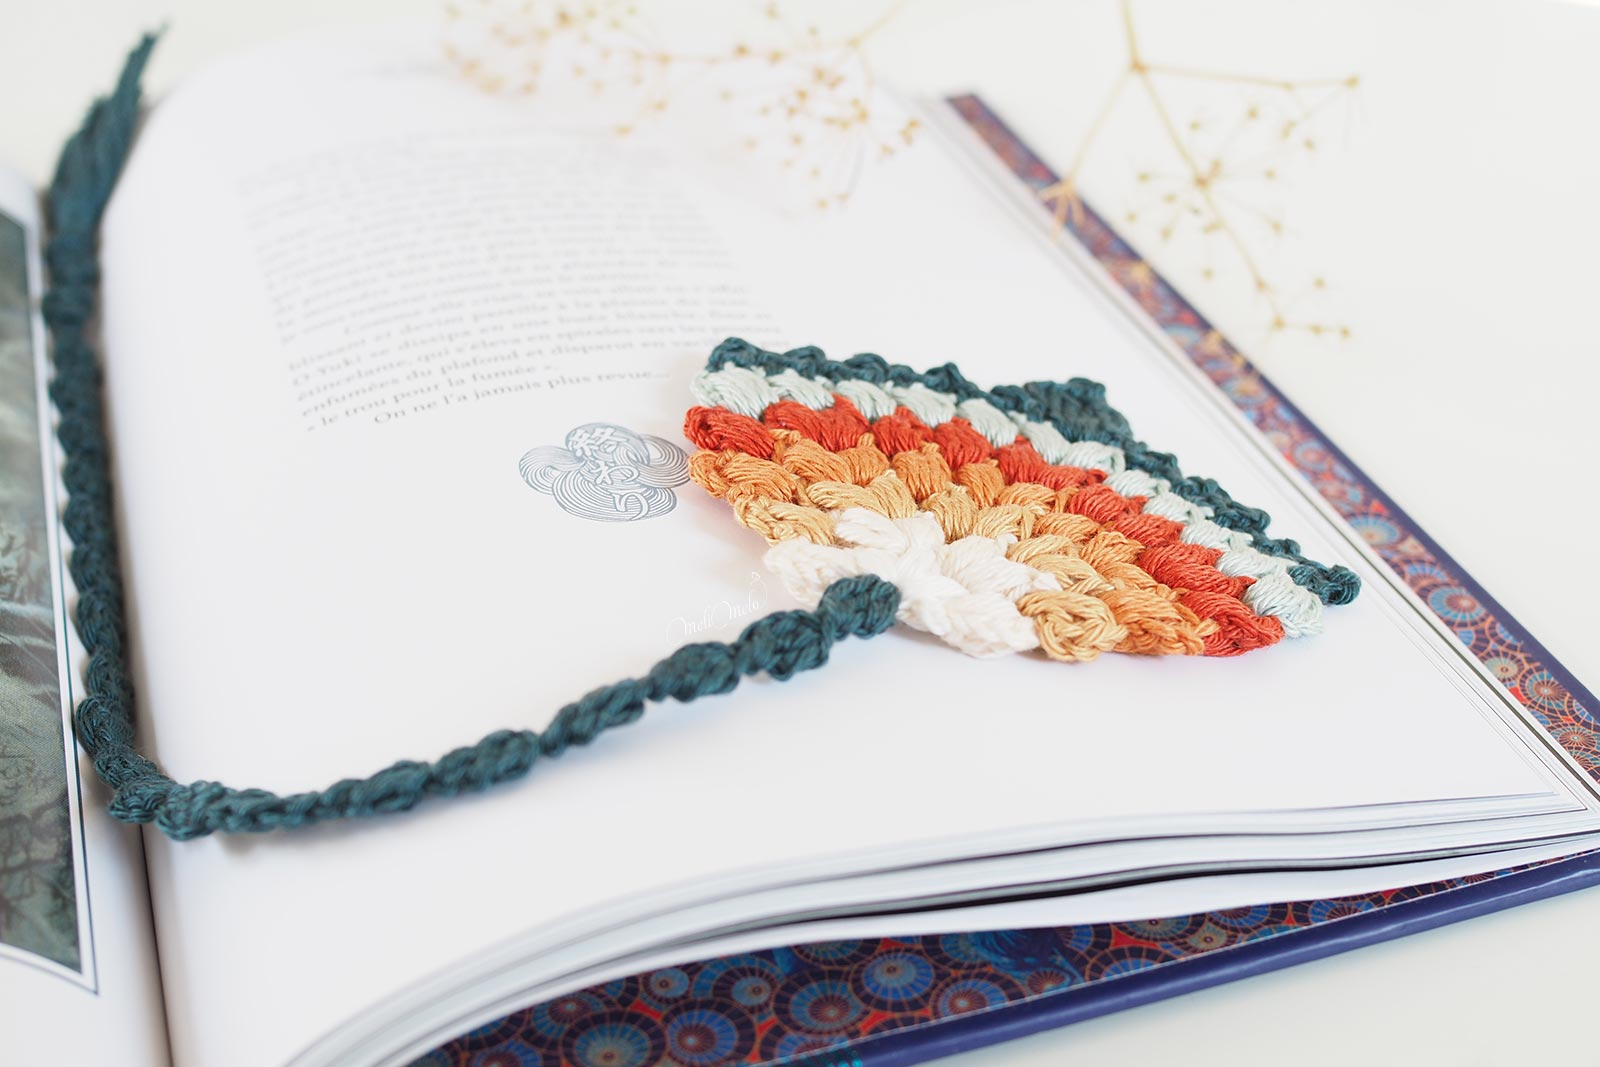 marque-page-crochet-plume-paon-automne-laboutiquedemelimelo